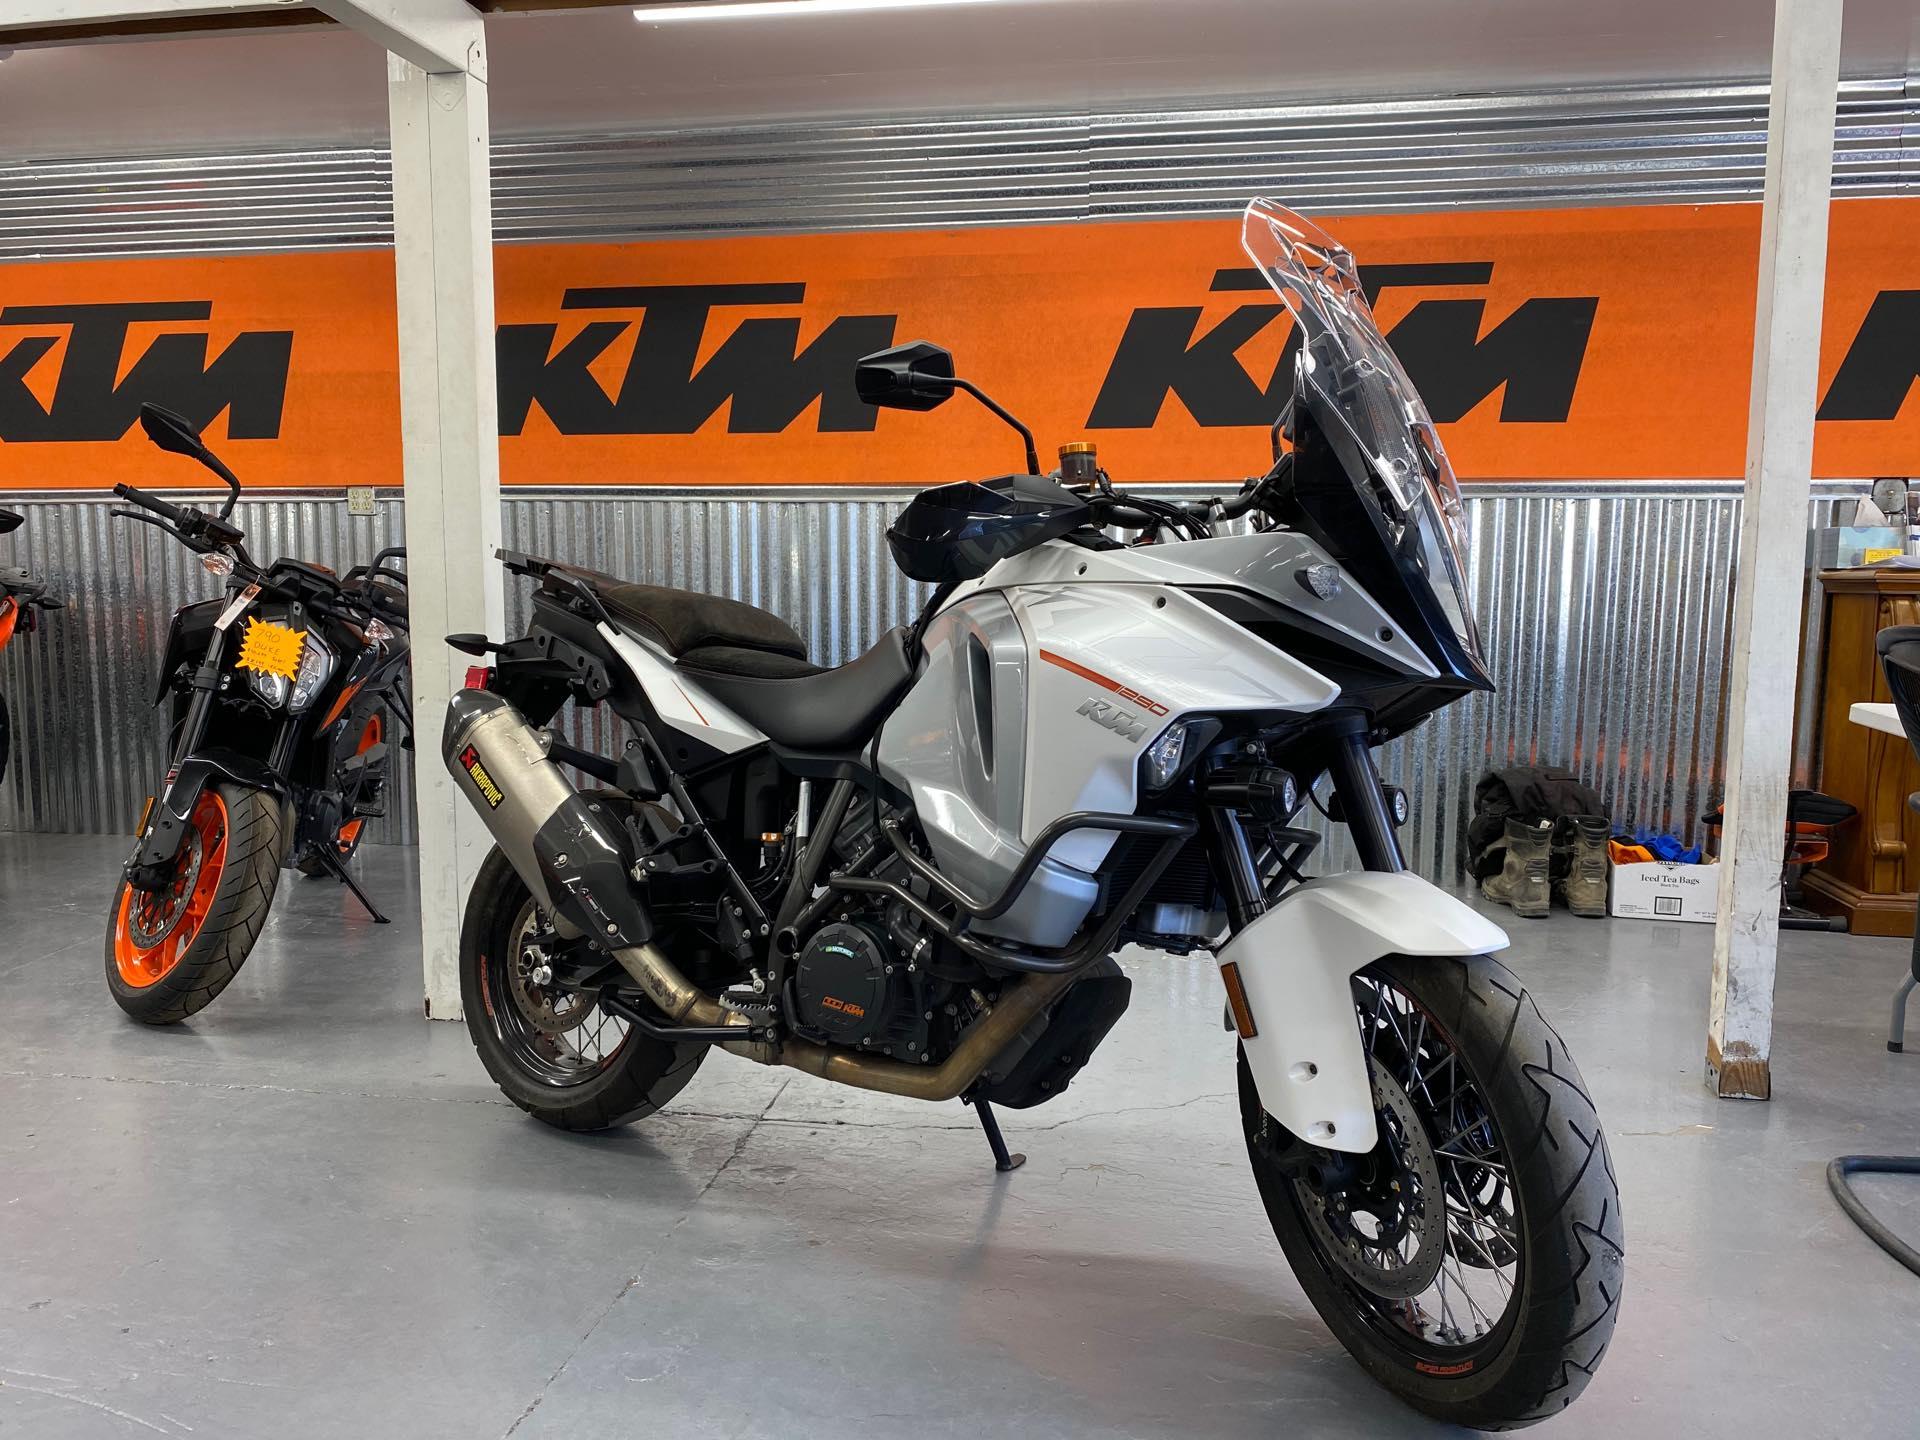 2015 KTM SPORT MOTORCYCLES 1290 SUPER ADVENTURE at Cascade Motorsports